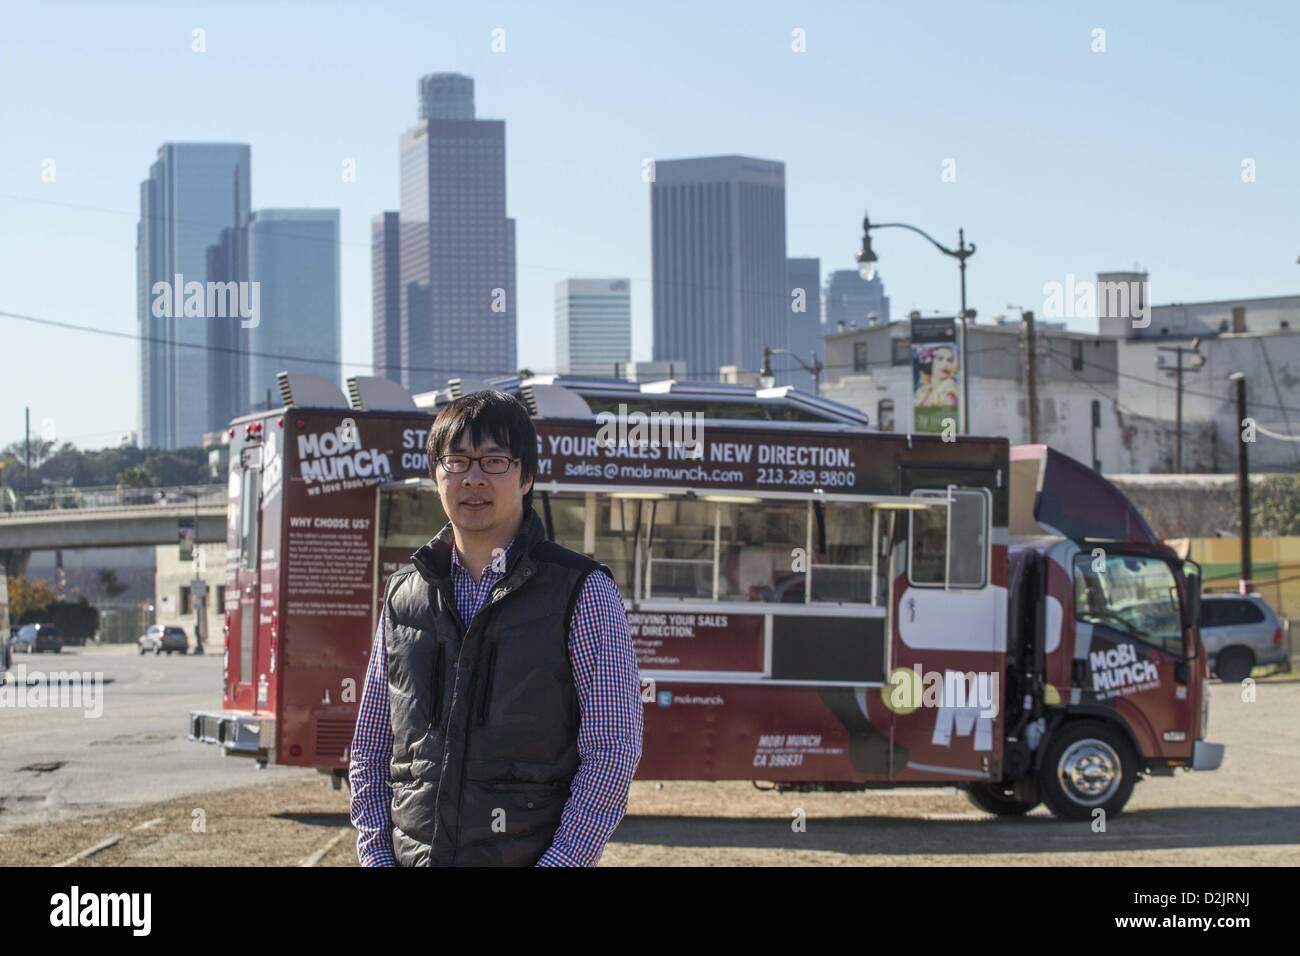 Los Angeles County Fair Food Trucks